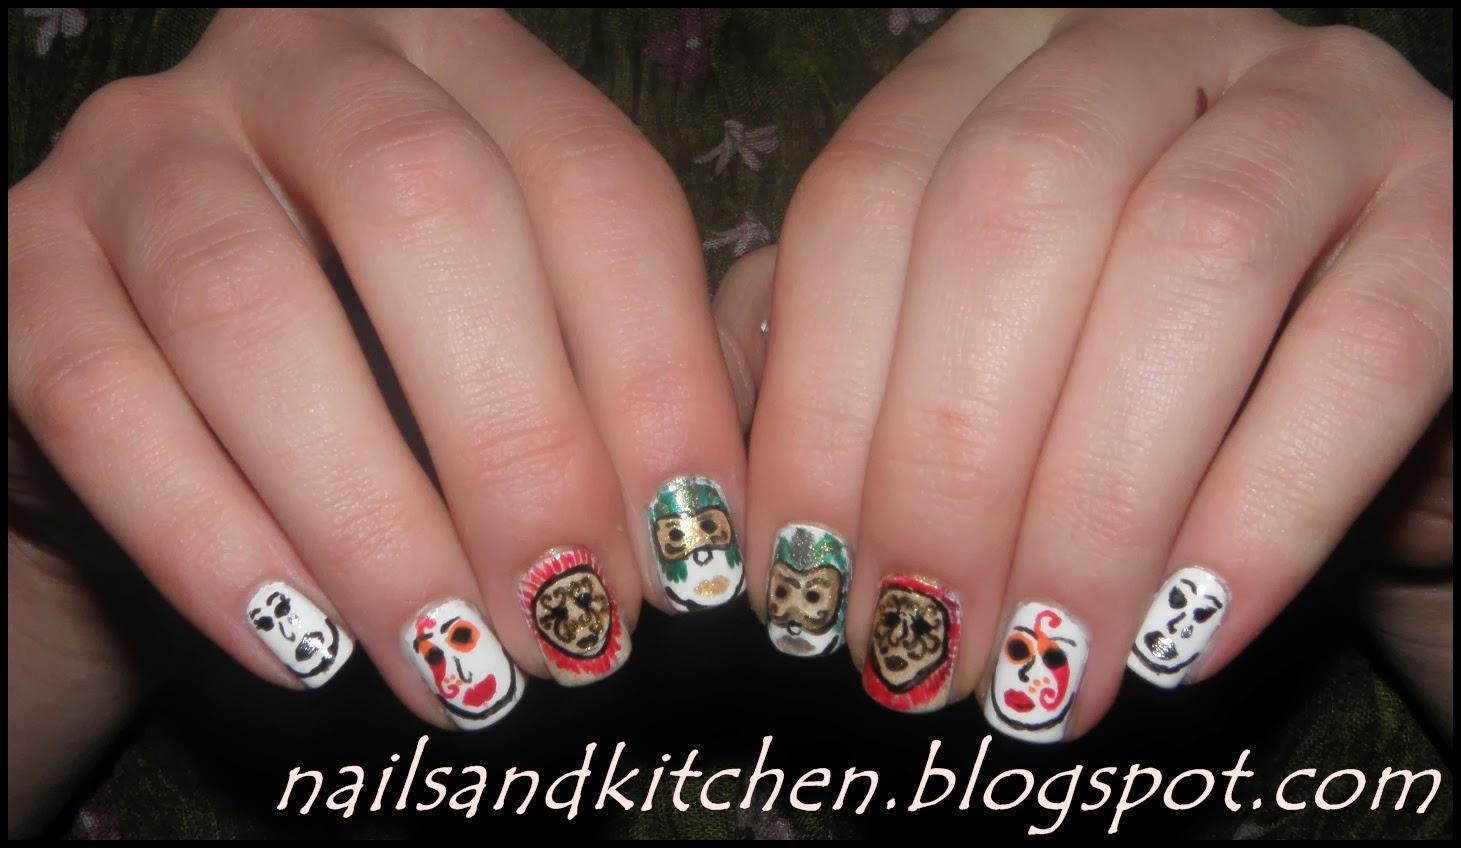 http://nailsandkitchen.blogspot.com/2014/02/karnawa-z-golden-rose-venicenails.html